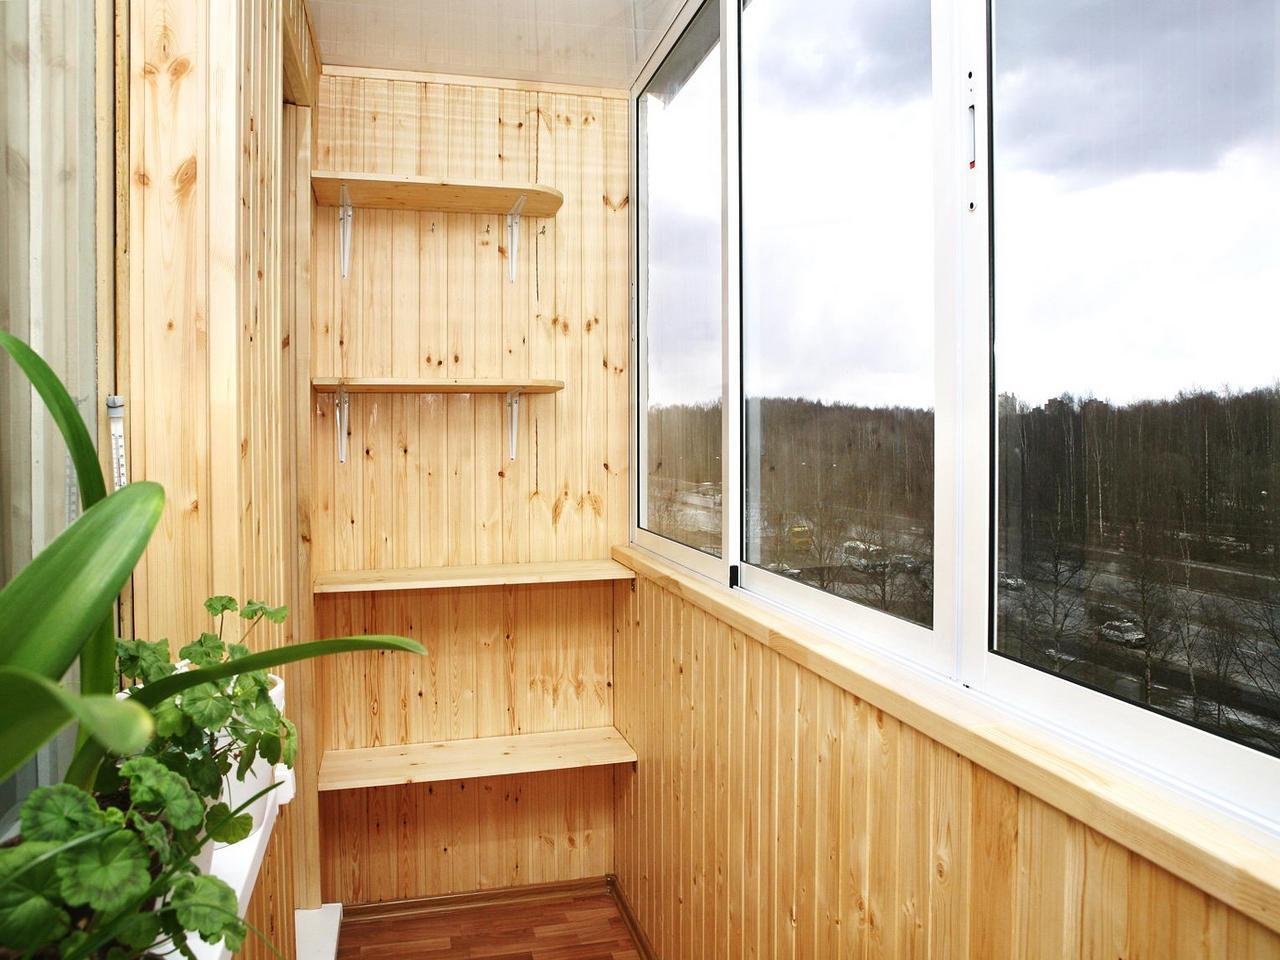 Дизайн балконов и лоджий - фото внутри и снаружи, отделка и .